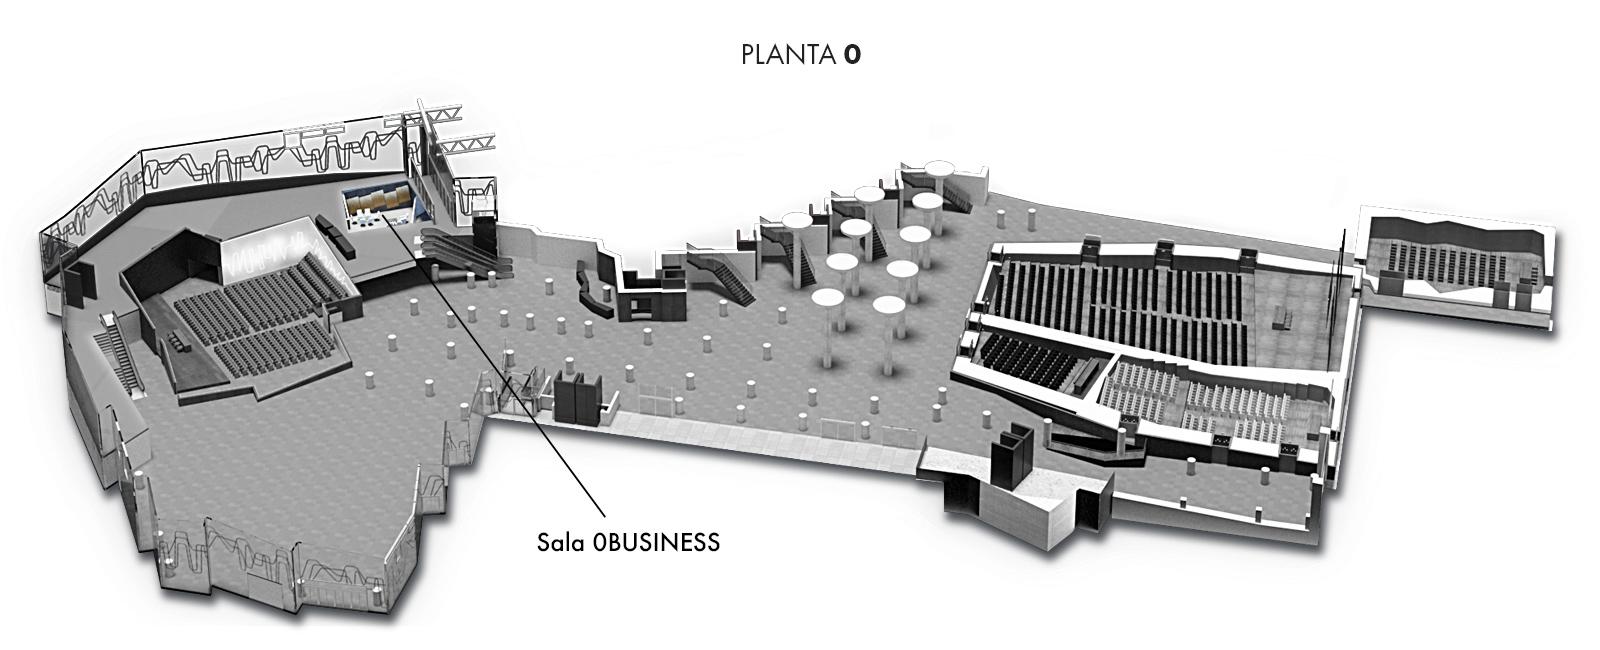 Sala 0BUSINESS, Planta 0 | Palacio Euskalduna Jauregia